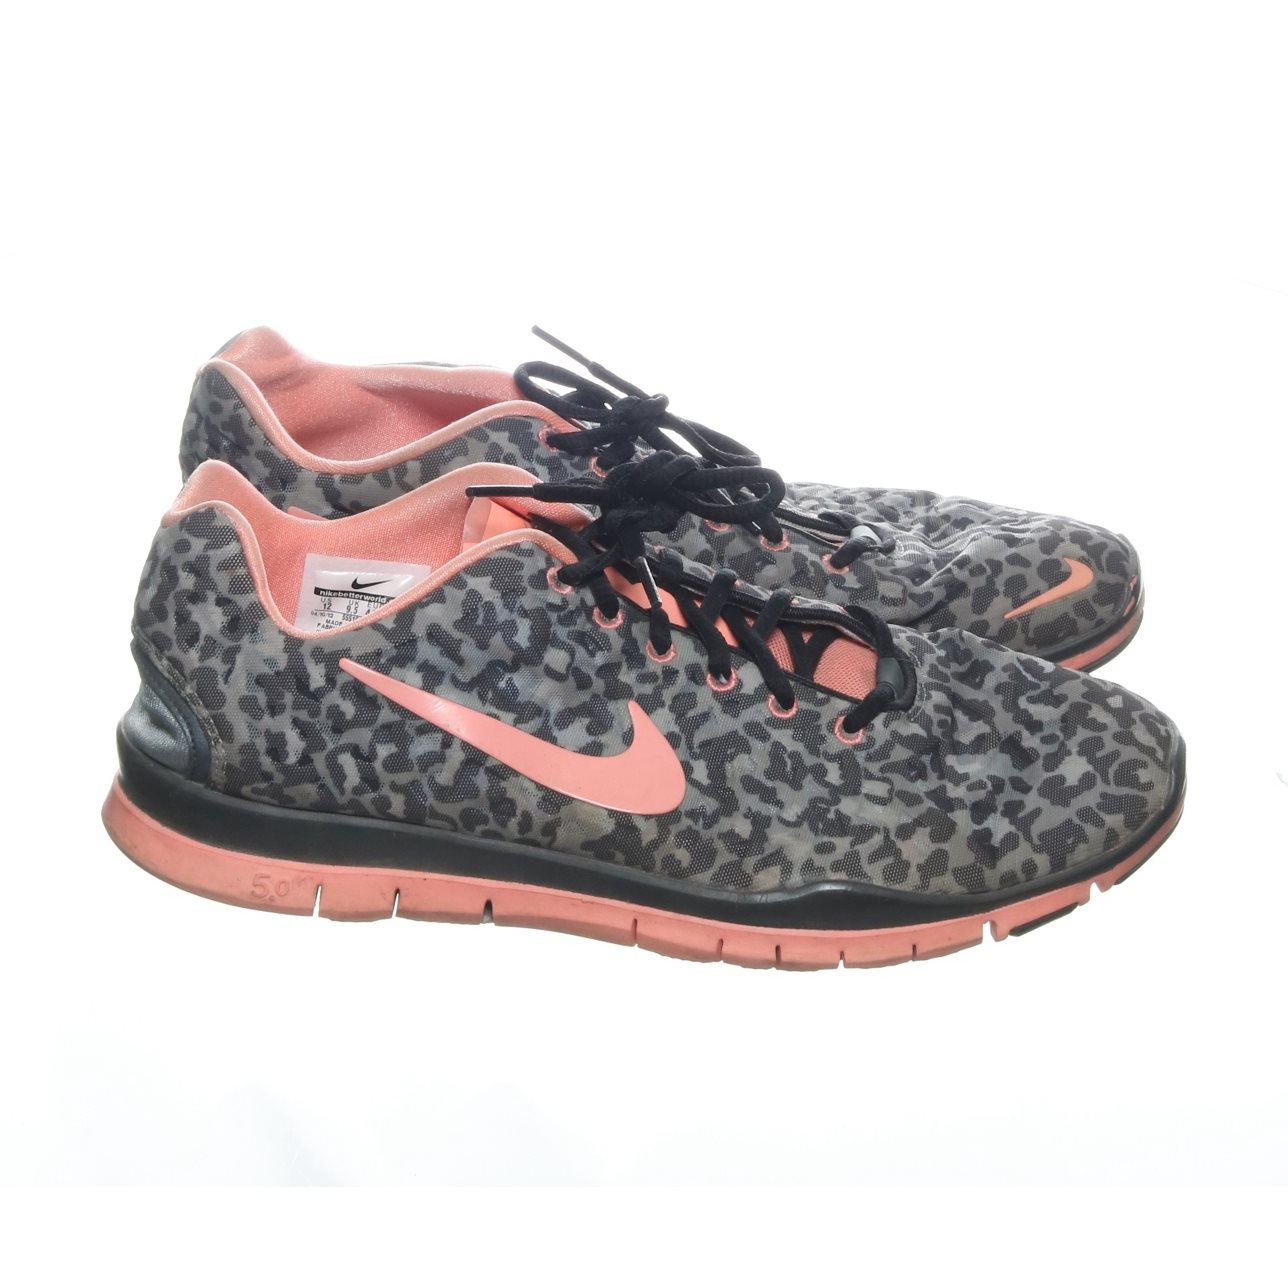 336f64c03efac Nike Free